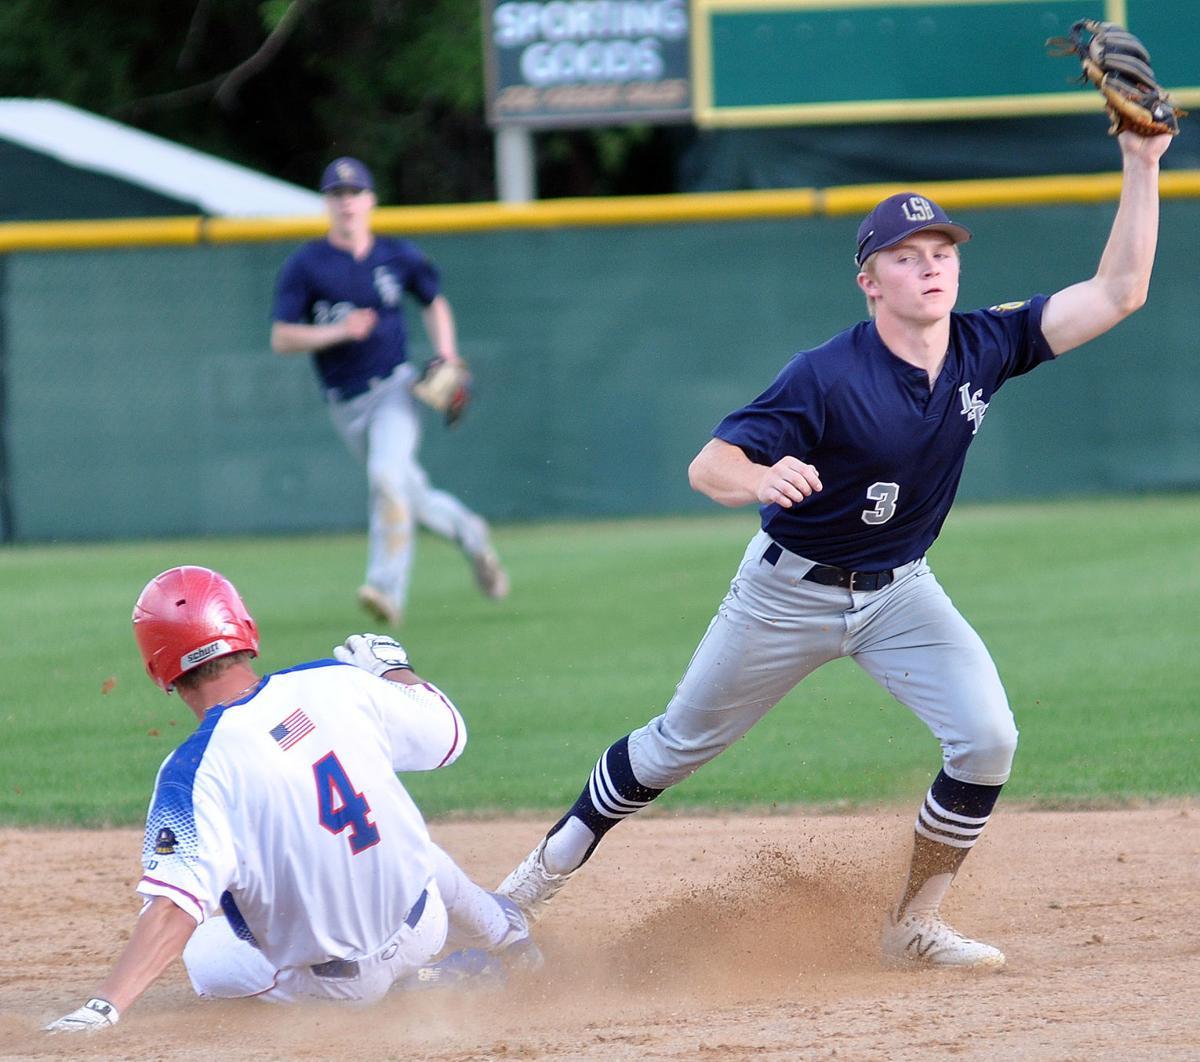 LSH U19 baseball Mitch Casperson.jpg